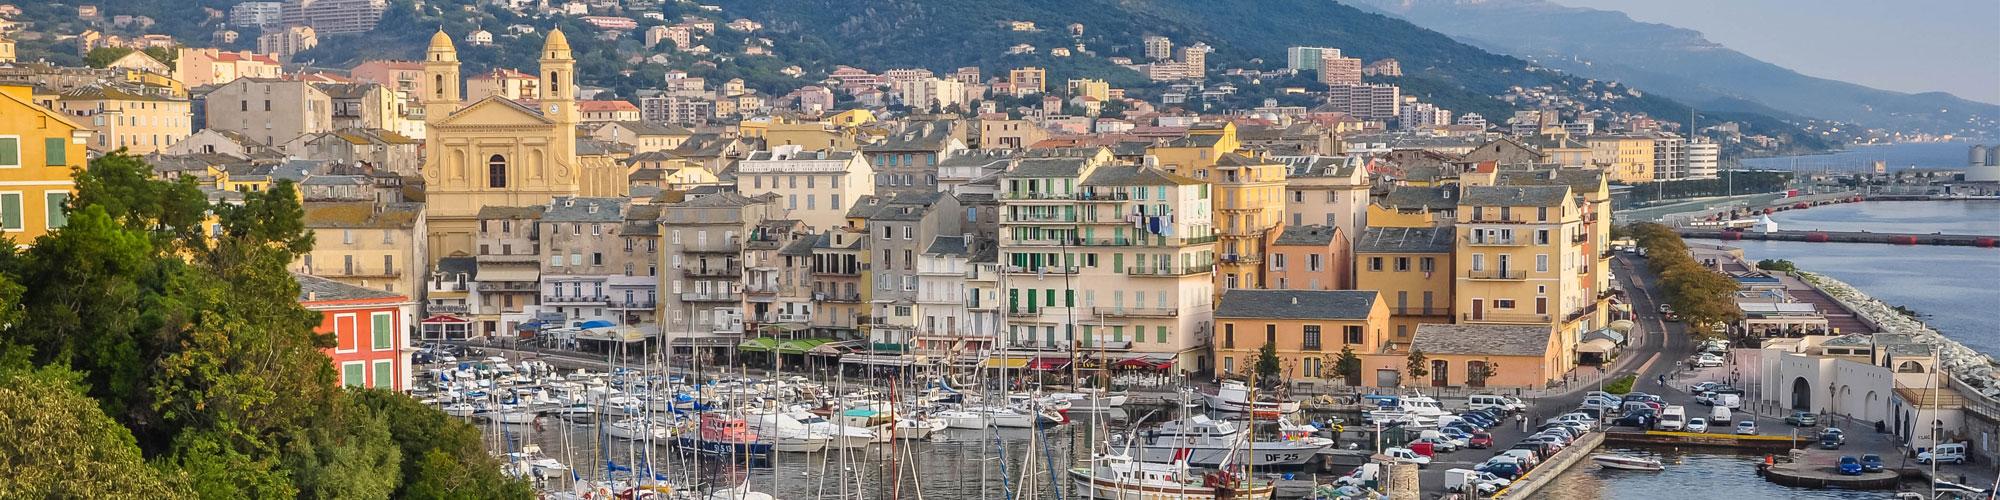 Paradisu - Korsika - Corse - Bastia